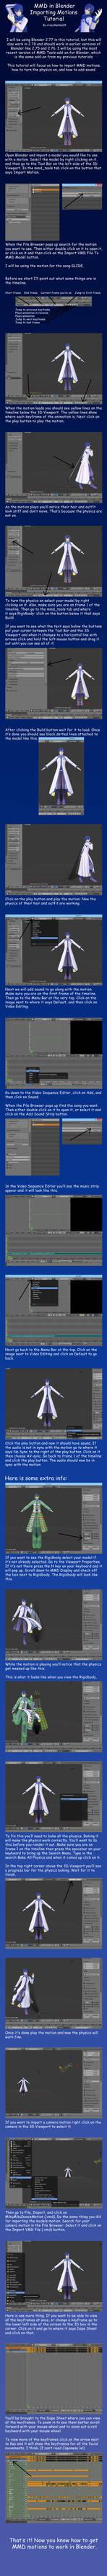 MMD in Blender Importing Motions Tutorial